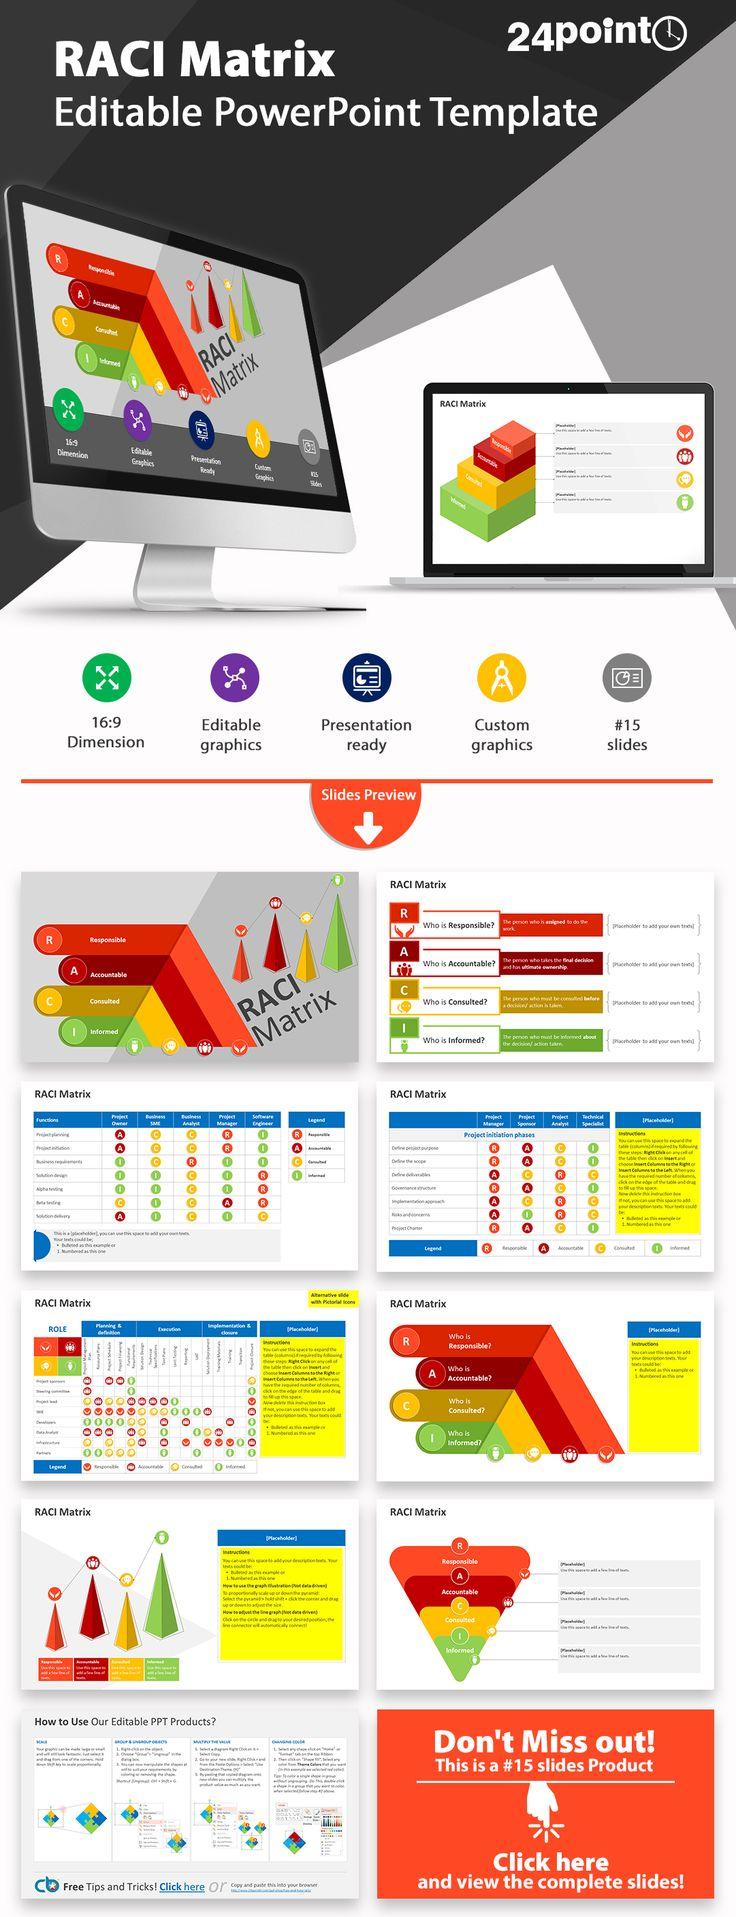 RACI Matrix | Model: Editable PowerPoint Template